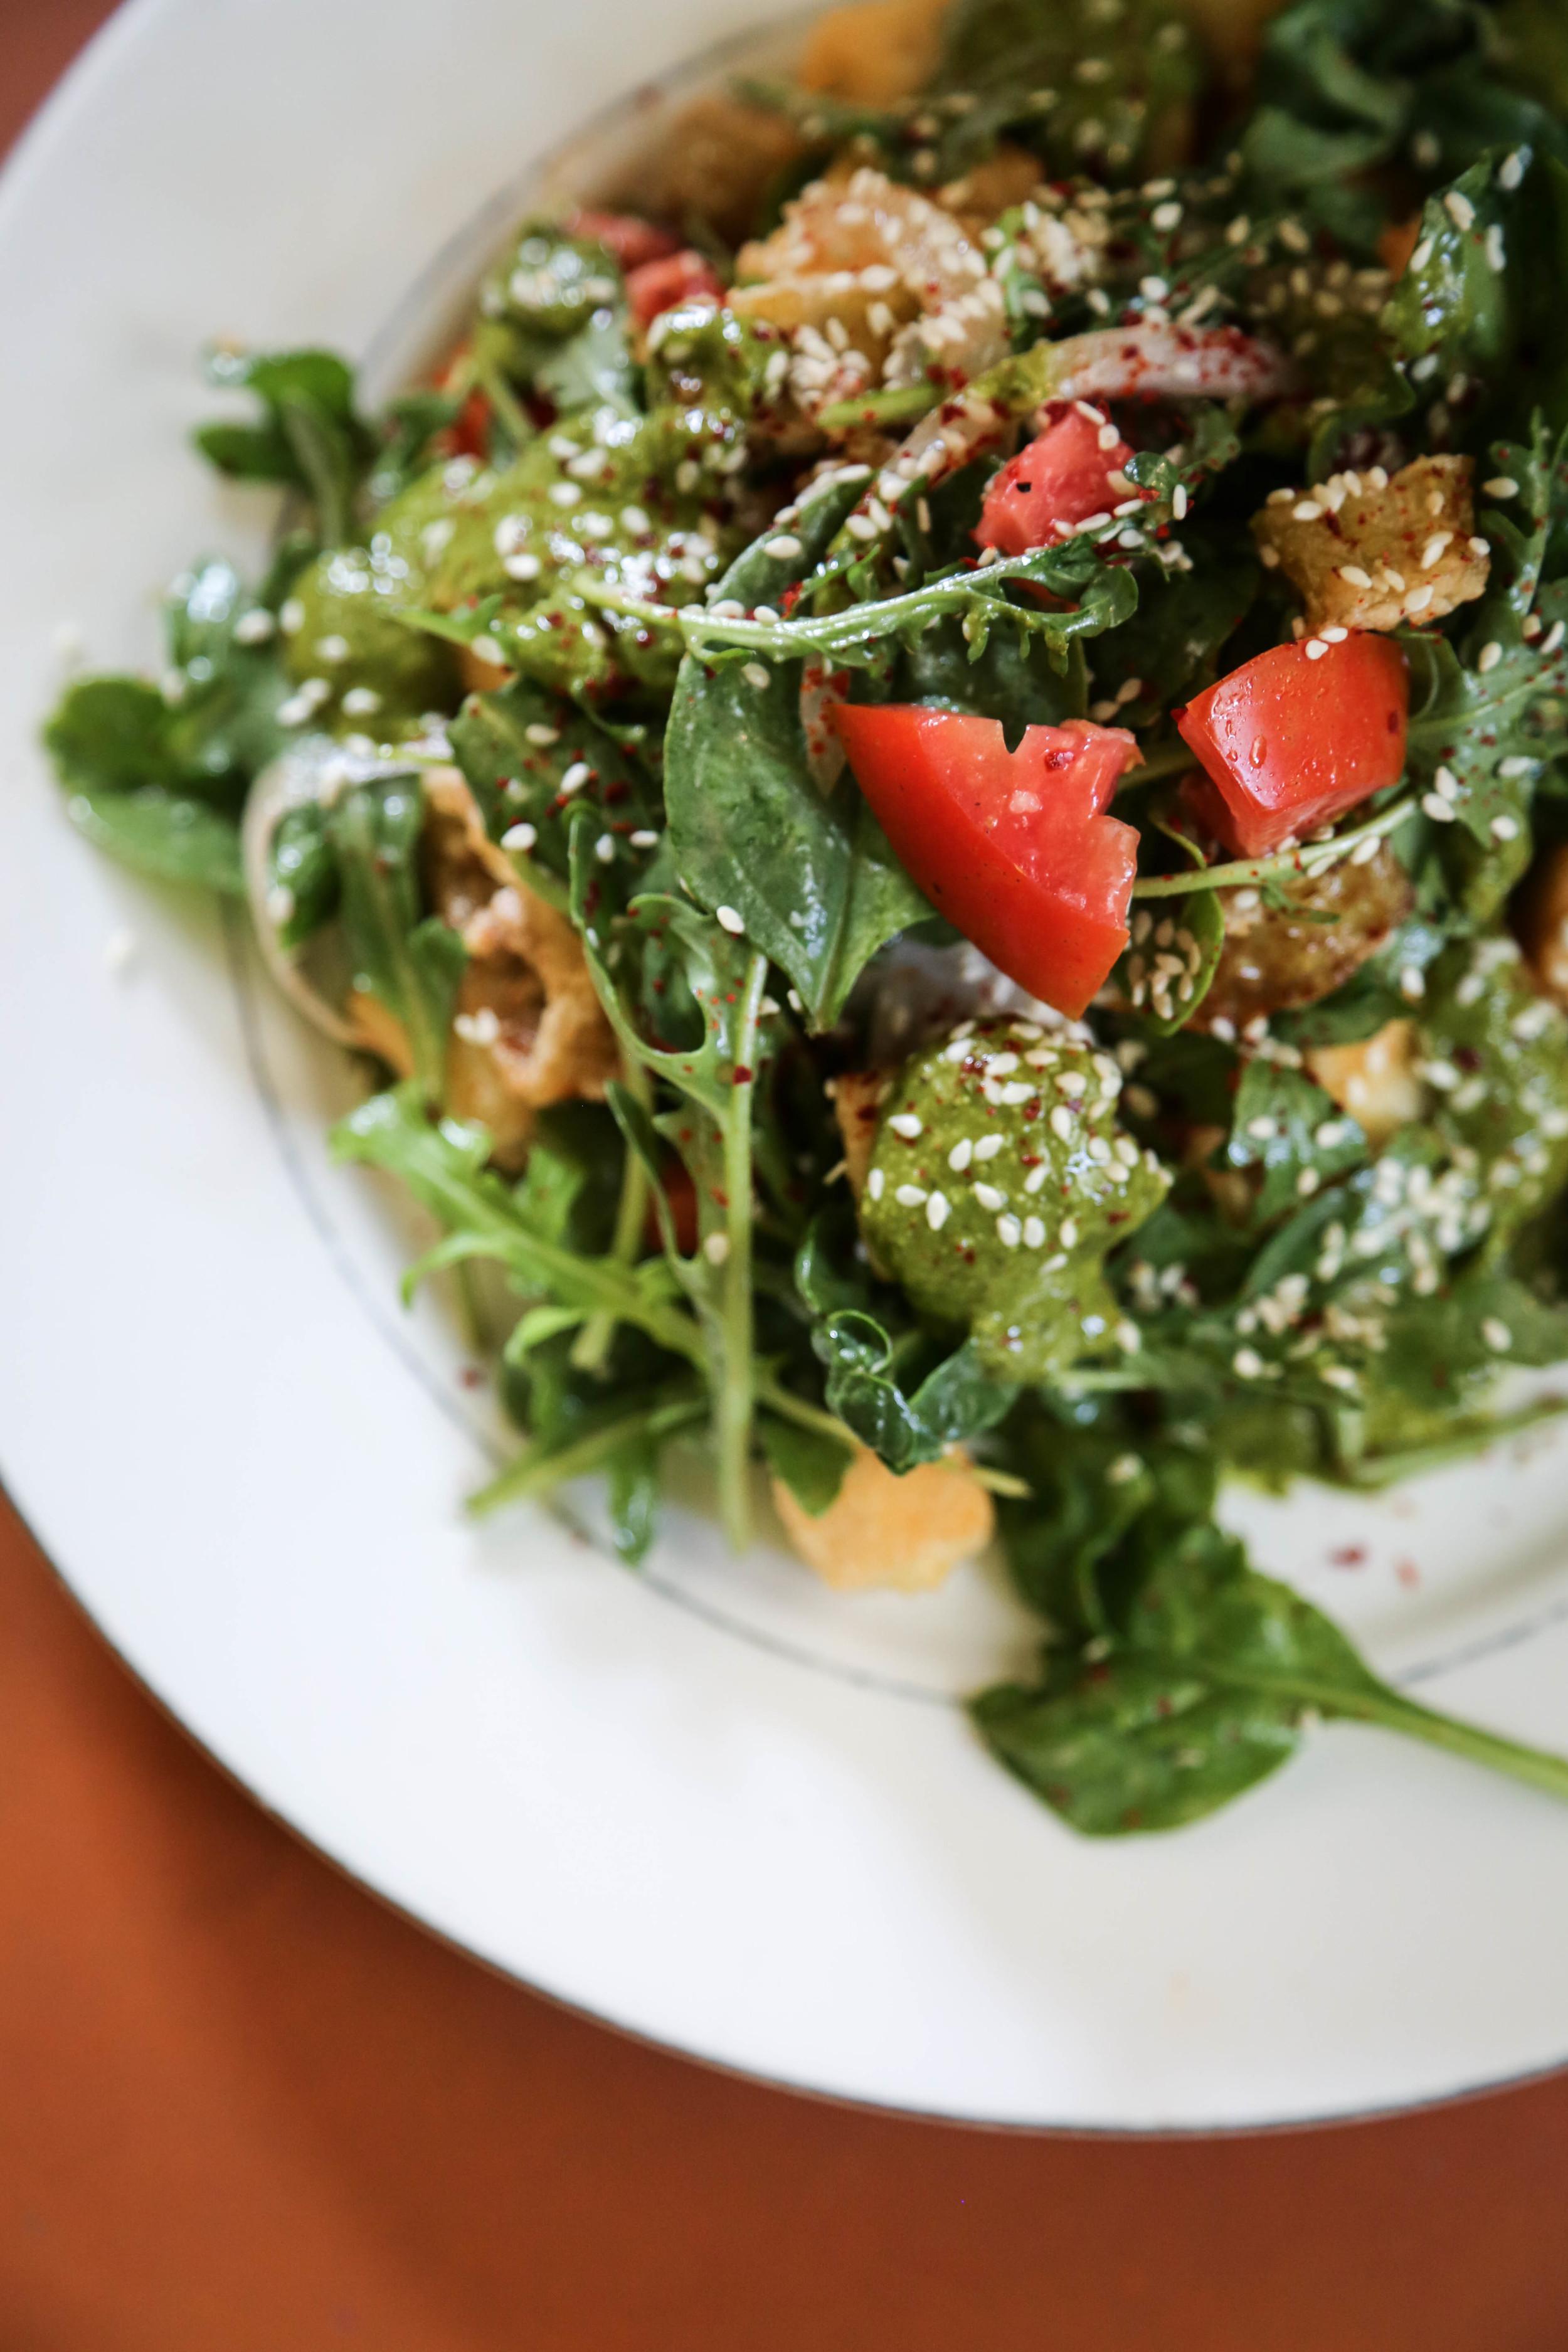 Fried Pickled Pepper & Tofu Salad